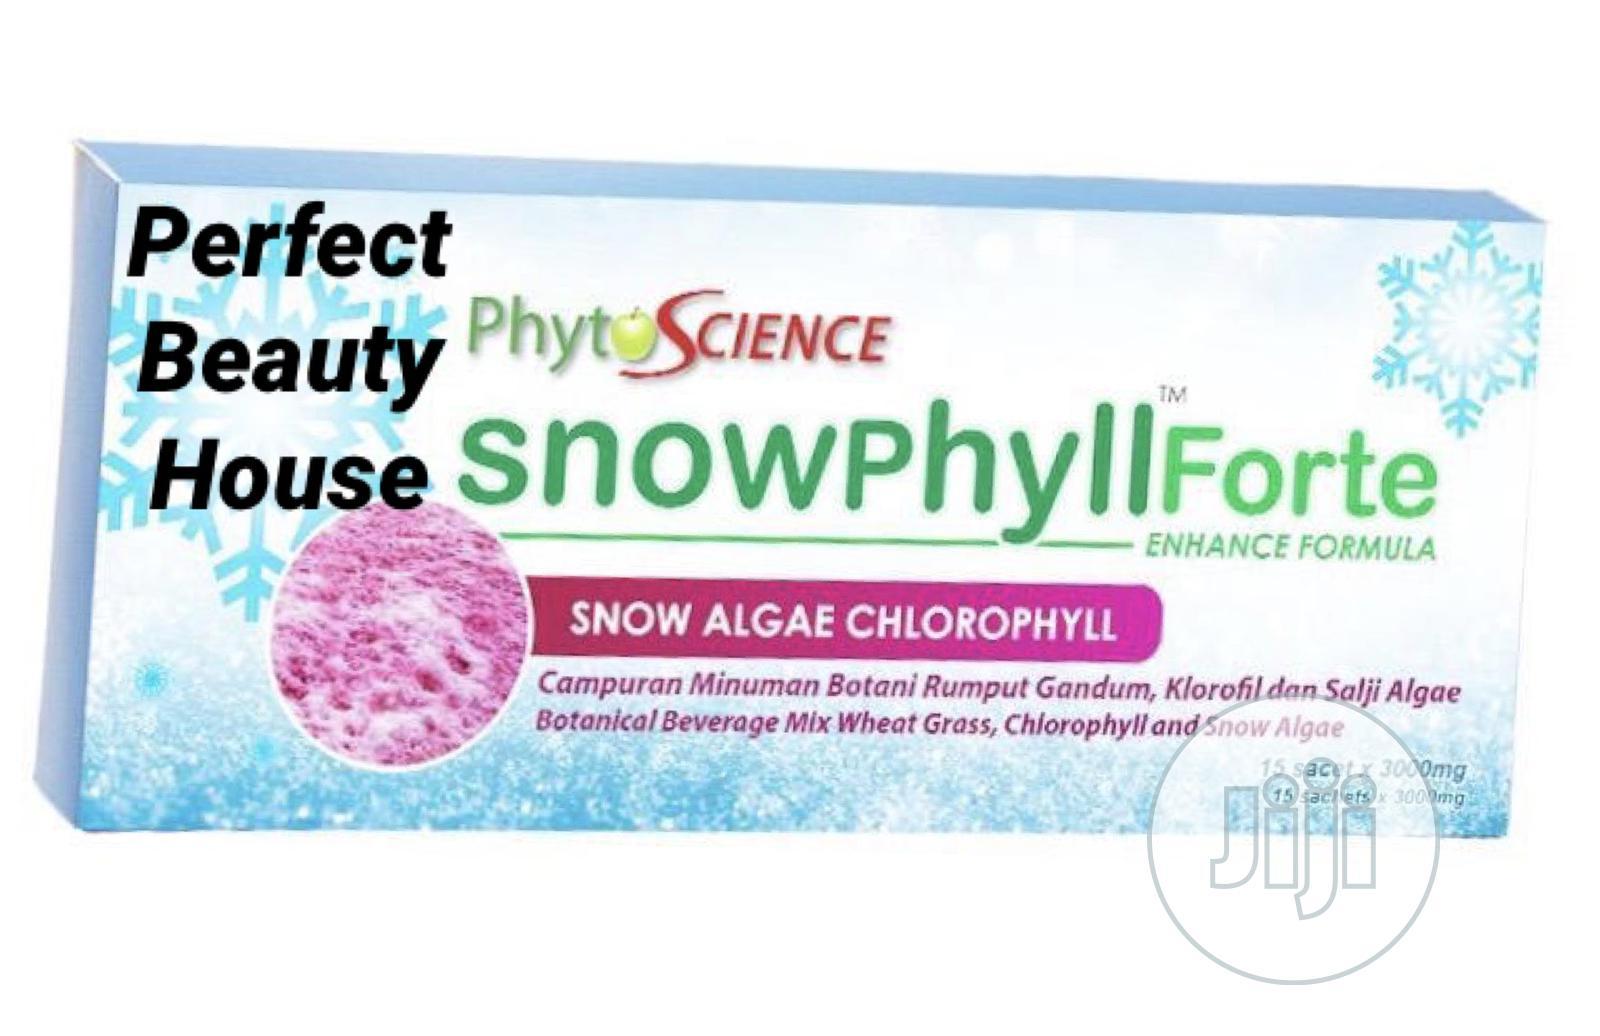 Phytoscience Snowphyll Forte